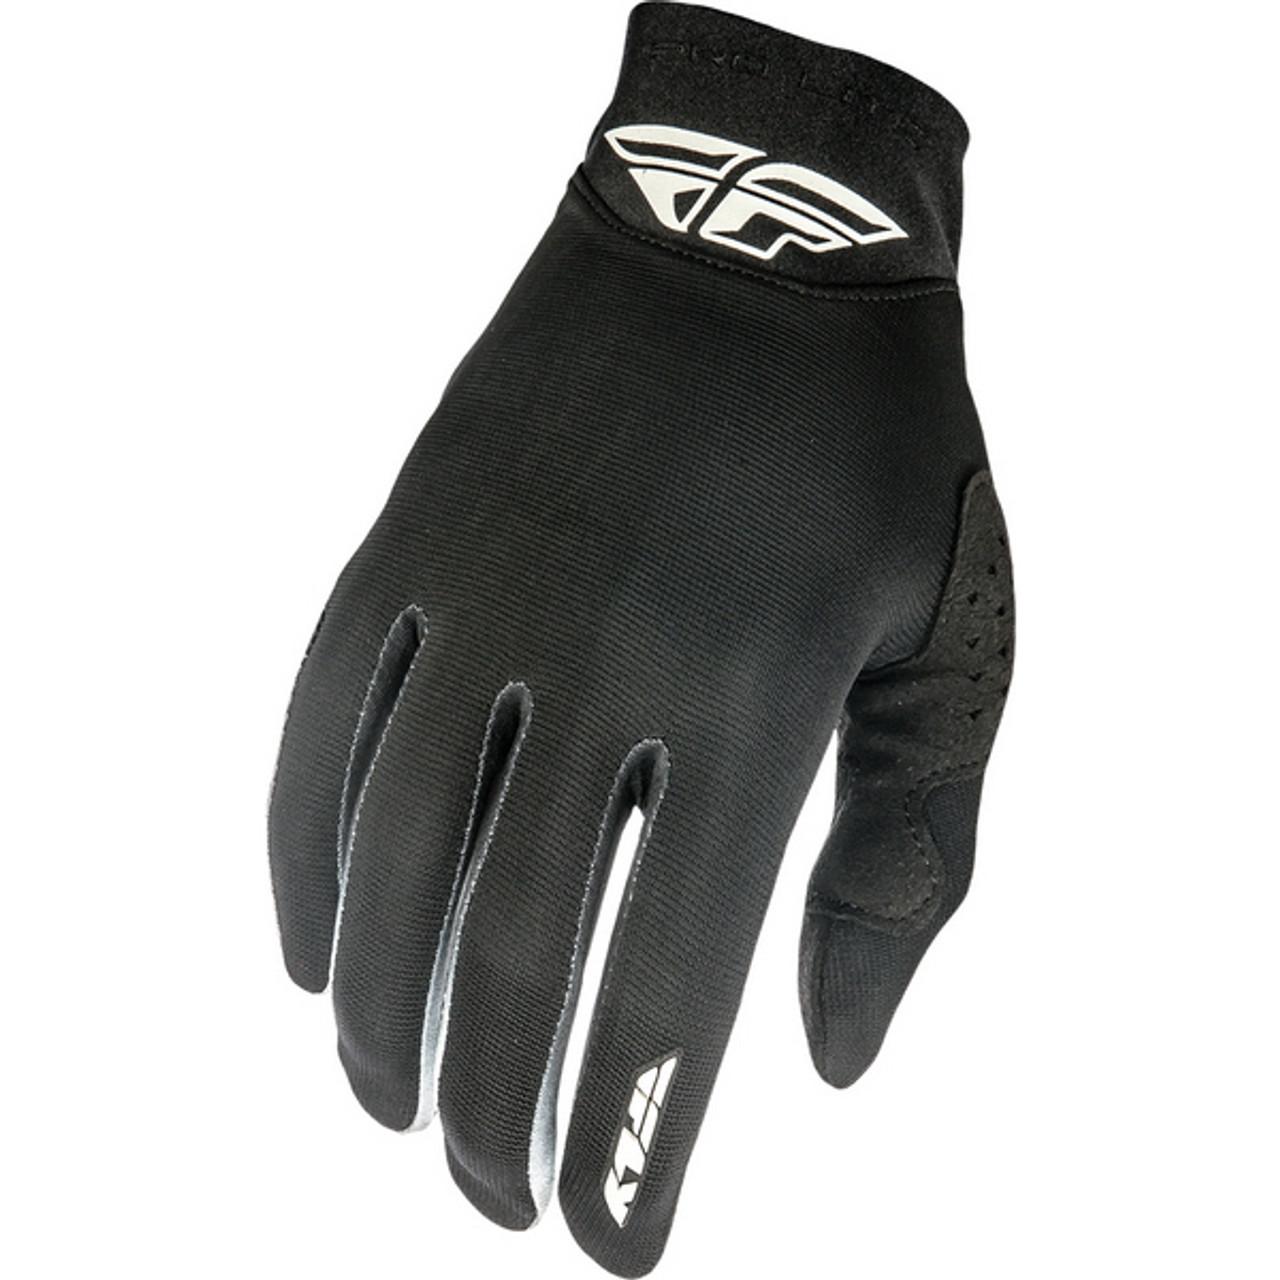 2018 Fly Racing Black Half /'n Half Open Finger Leather Motorcycle Gloves Pick